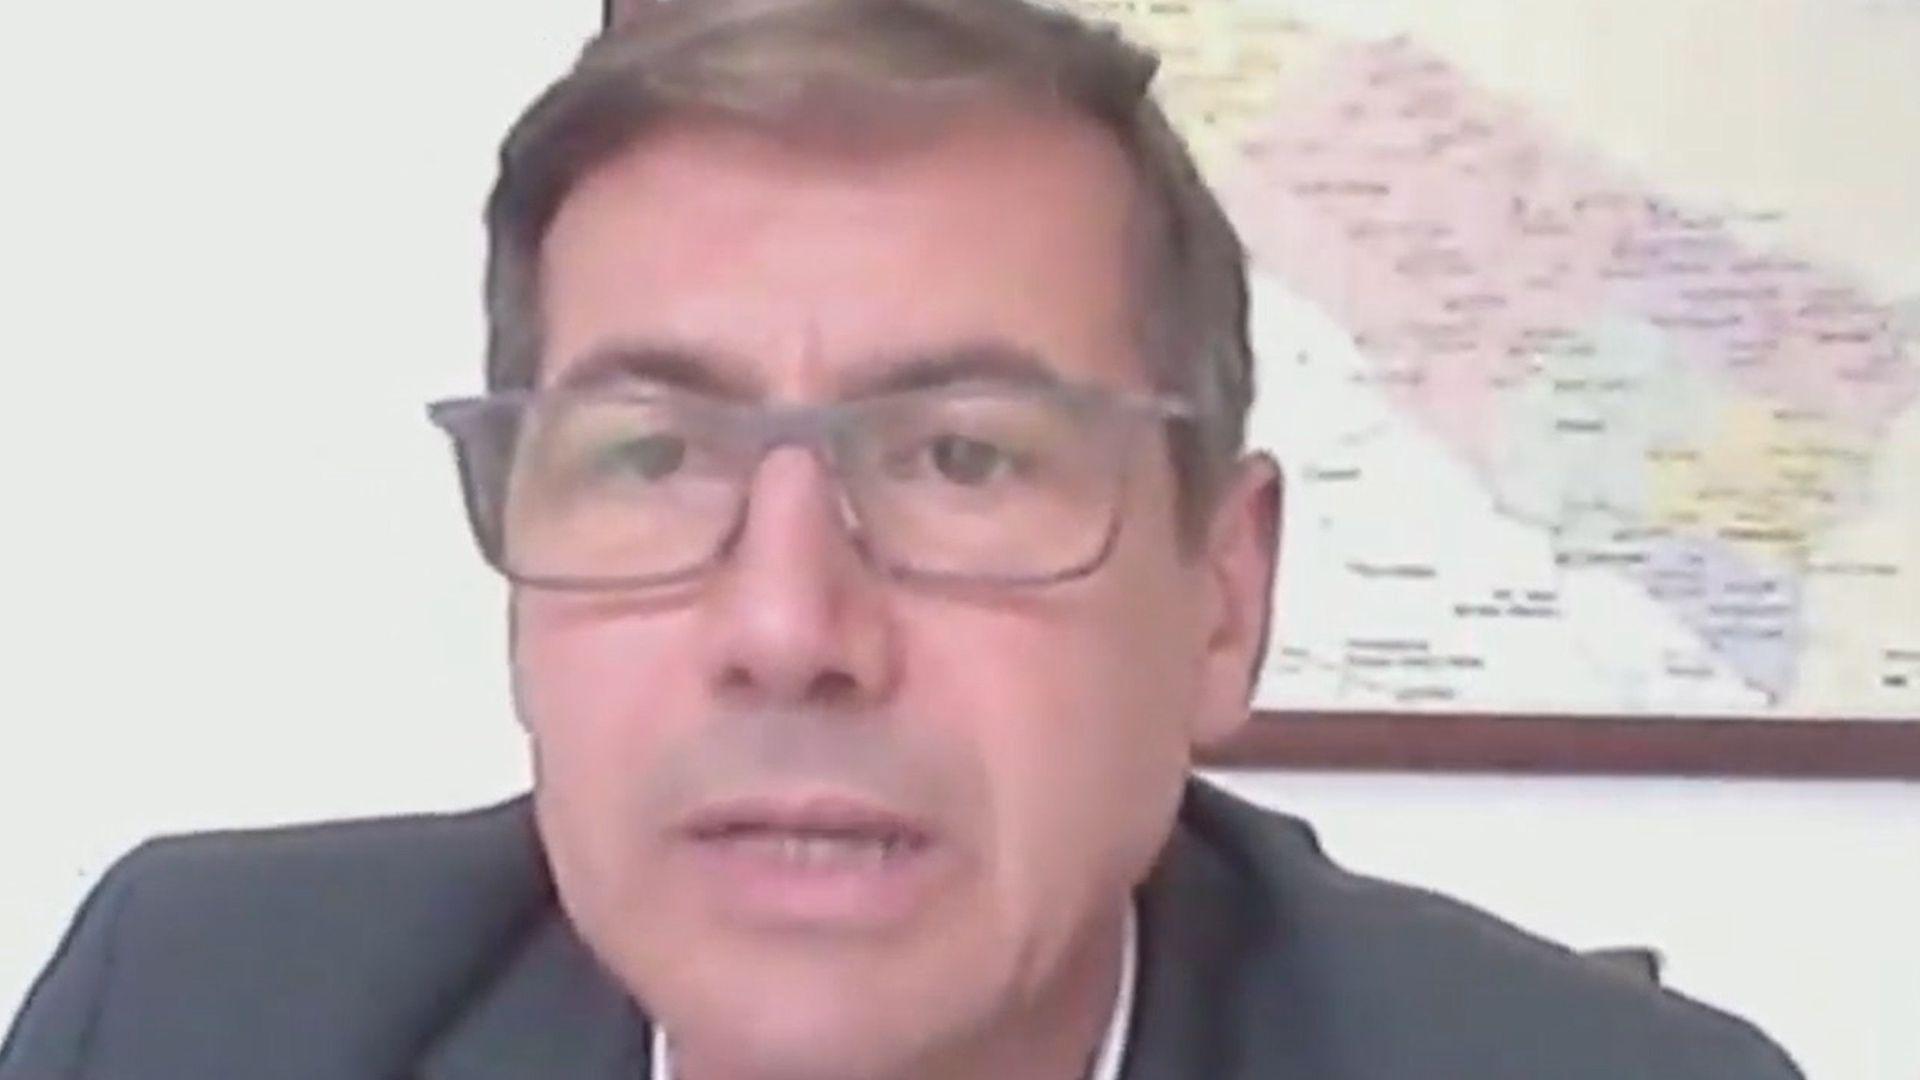 Senado: la sesión empezó con un fastidio y chicanas de Cristina Kirchner a Martín Lousteau